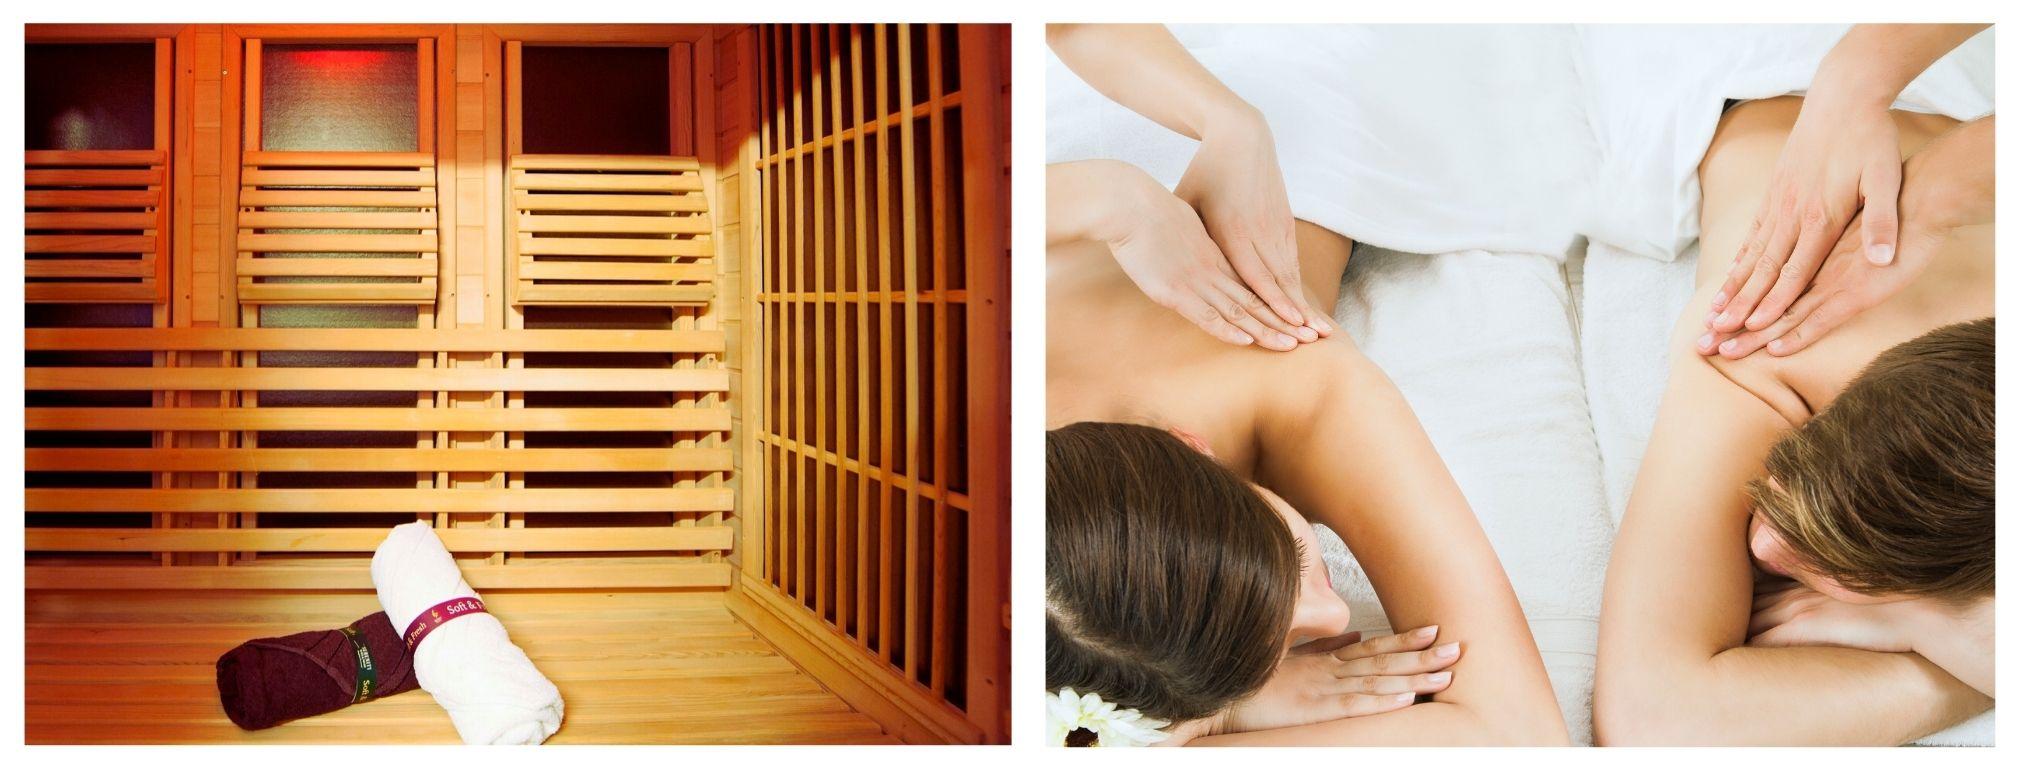 oferta speciala sauna-masaj de cuplu